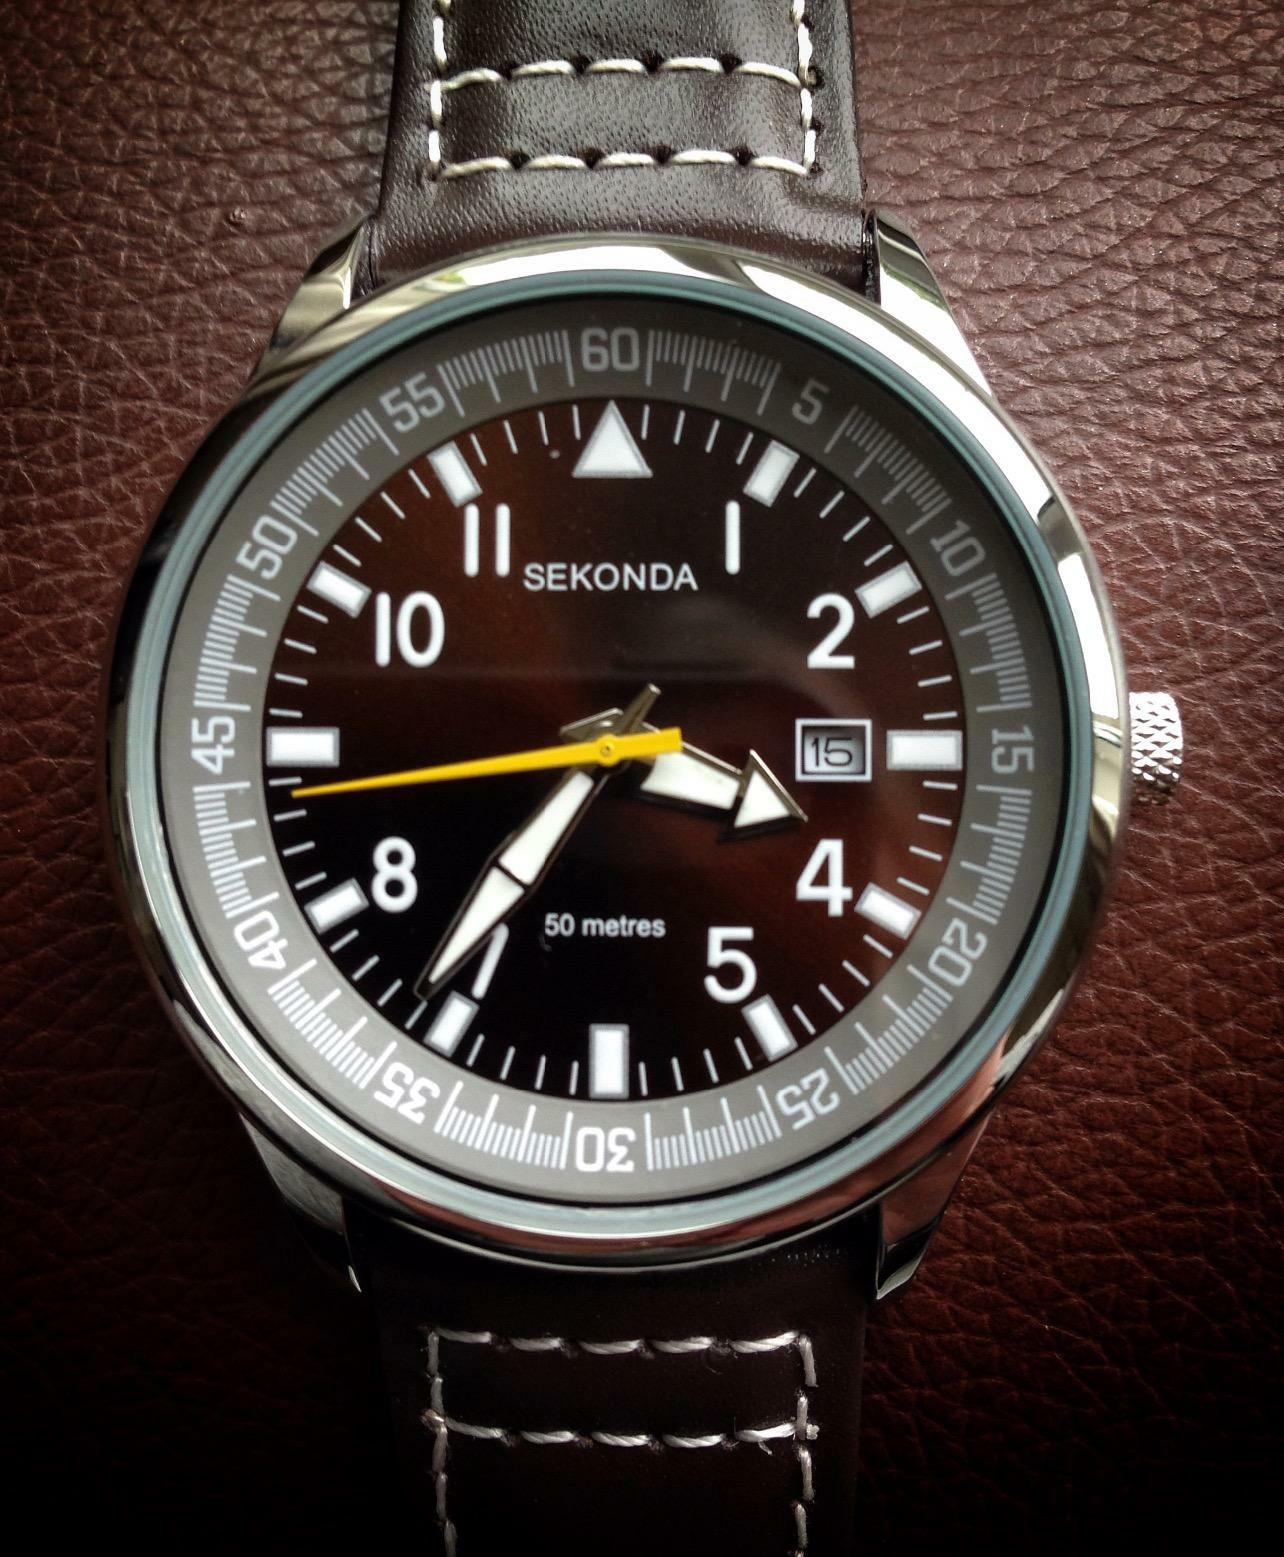 Sekonda Men's Quartz Watch with Analogue Display - £20 @ Amazon